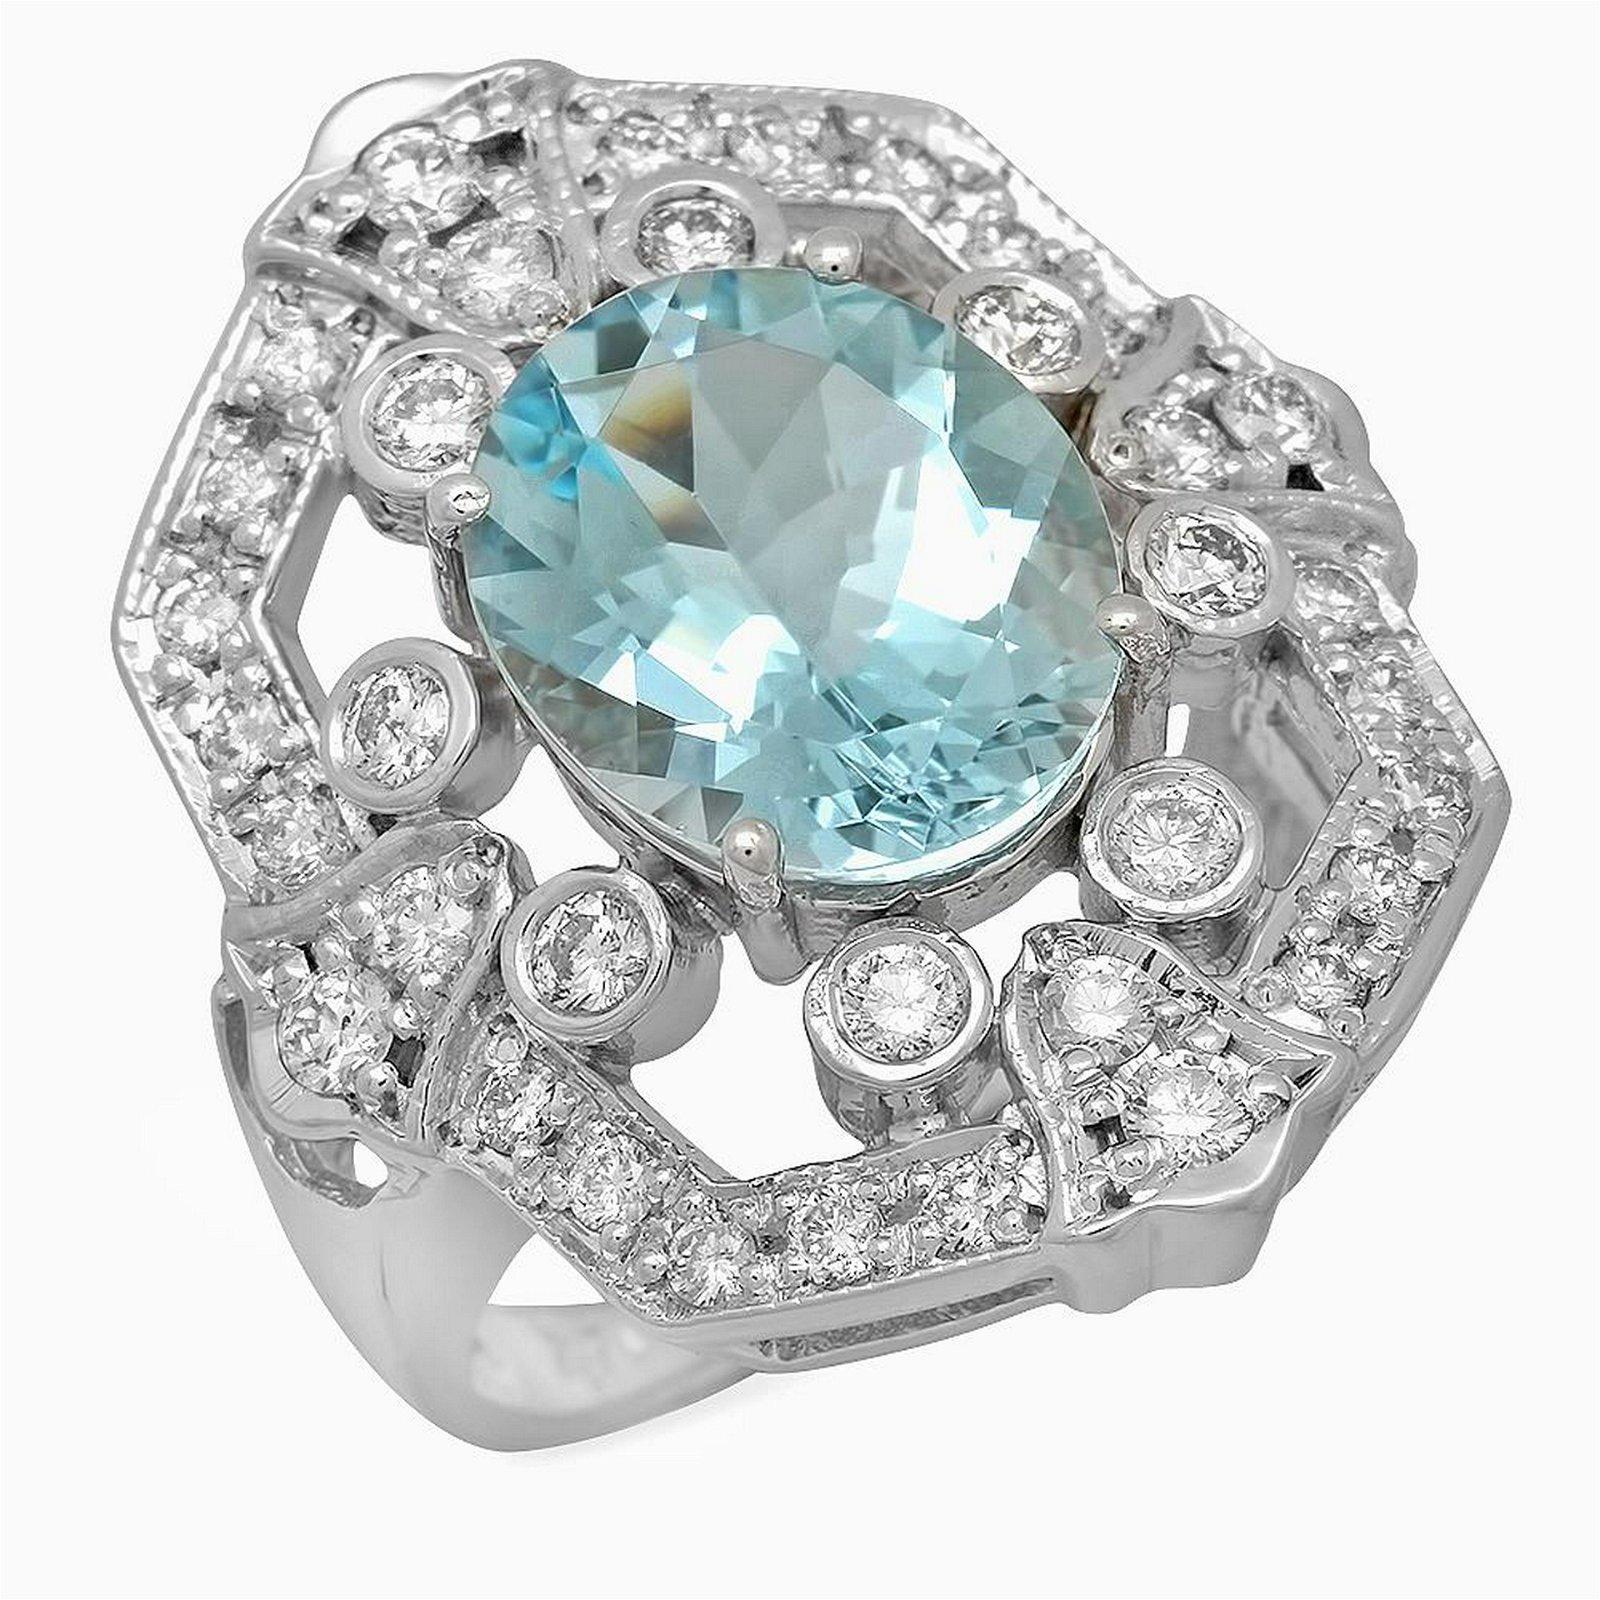 14K Gold 3.81ct Aquamarine 0.99ct Diamond Ring